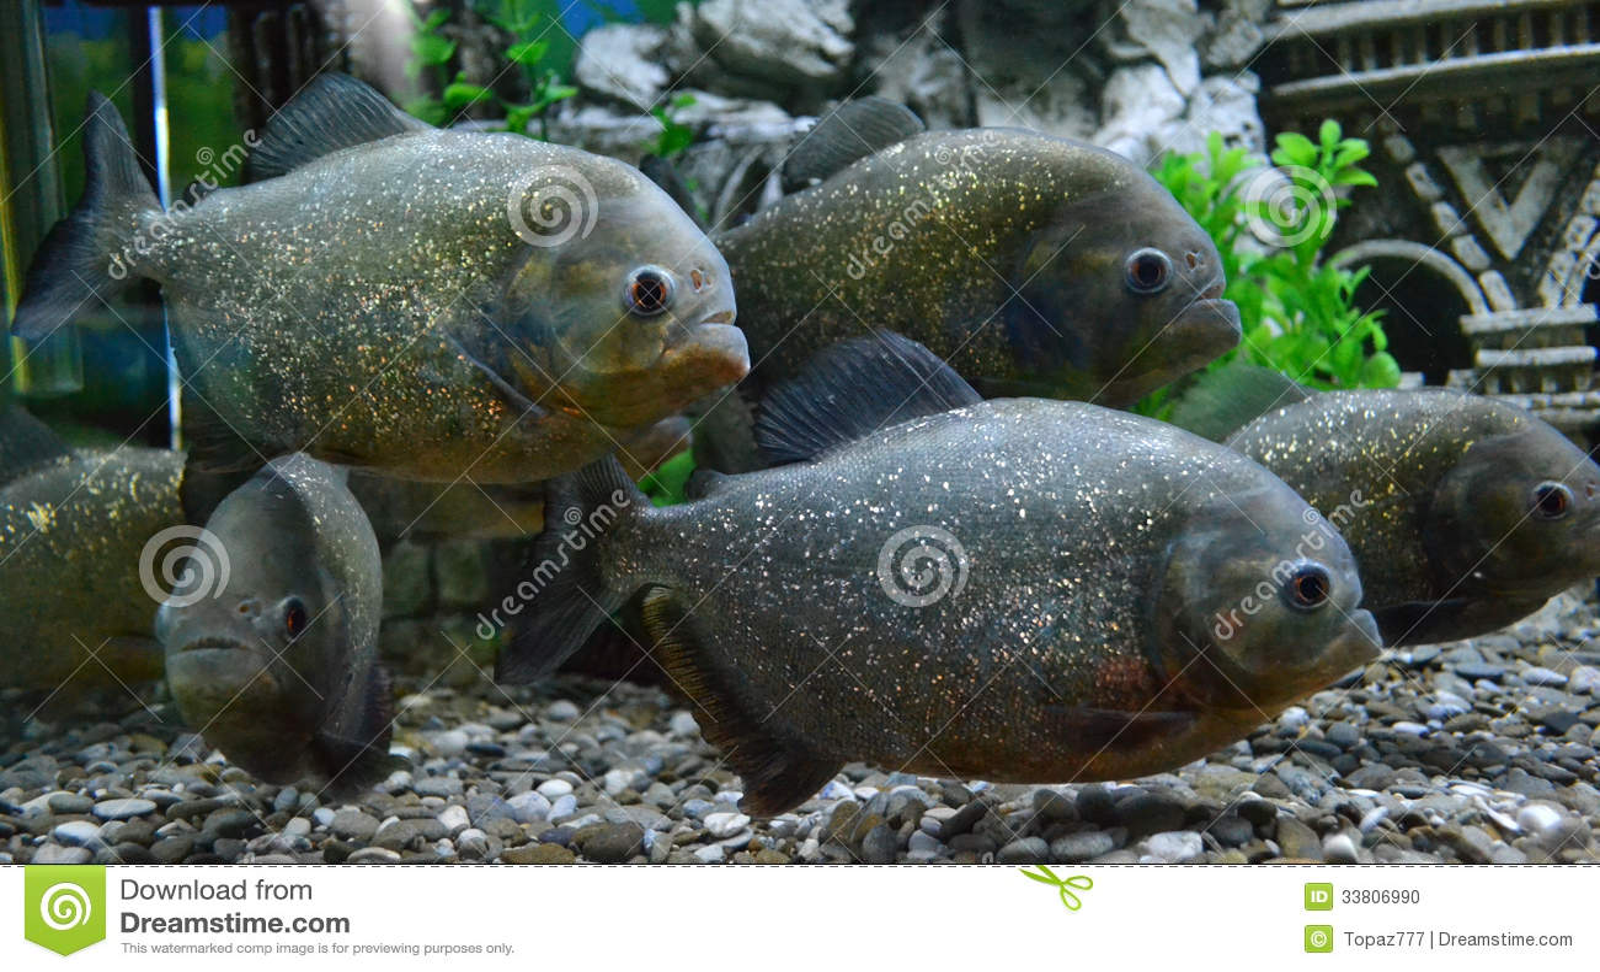 Piranha fish in an aquarium stock photo image 33806990 for Piranha fish tank